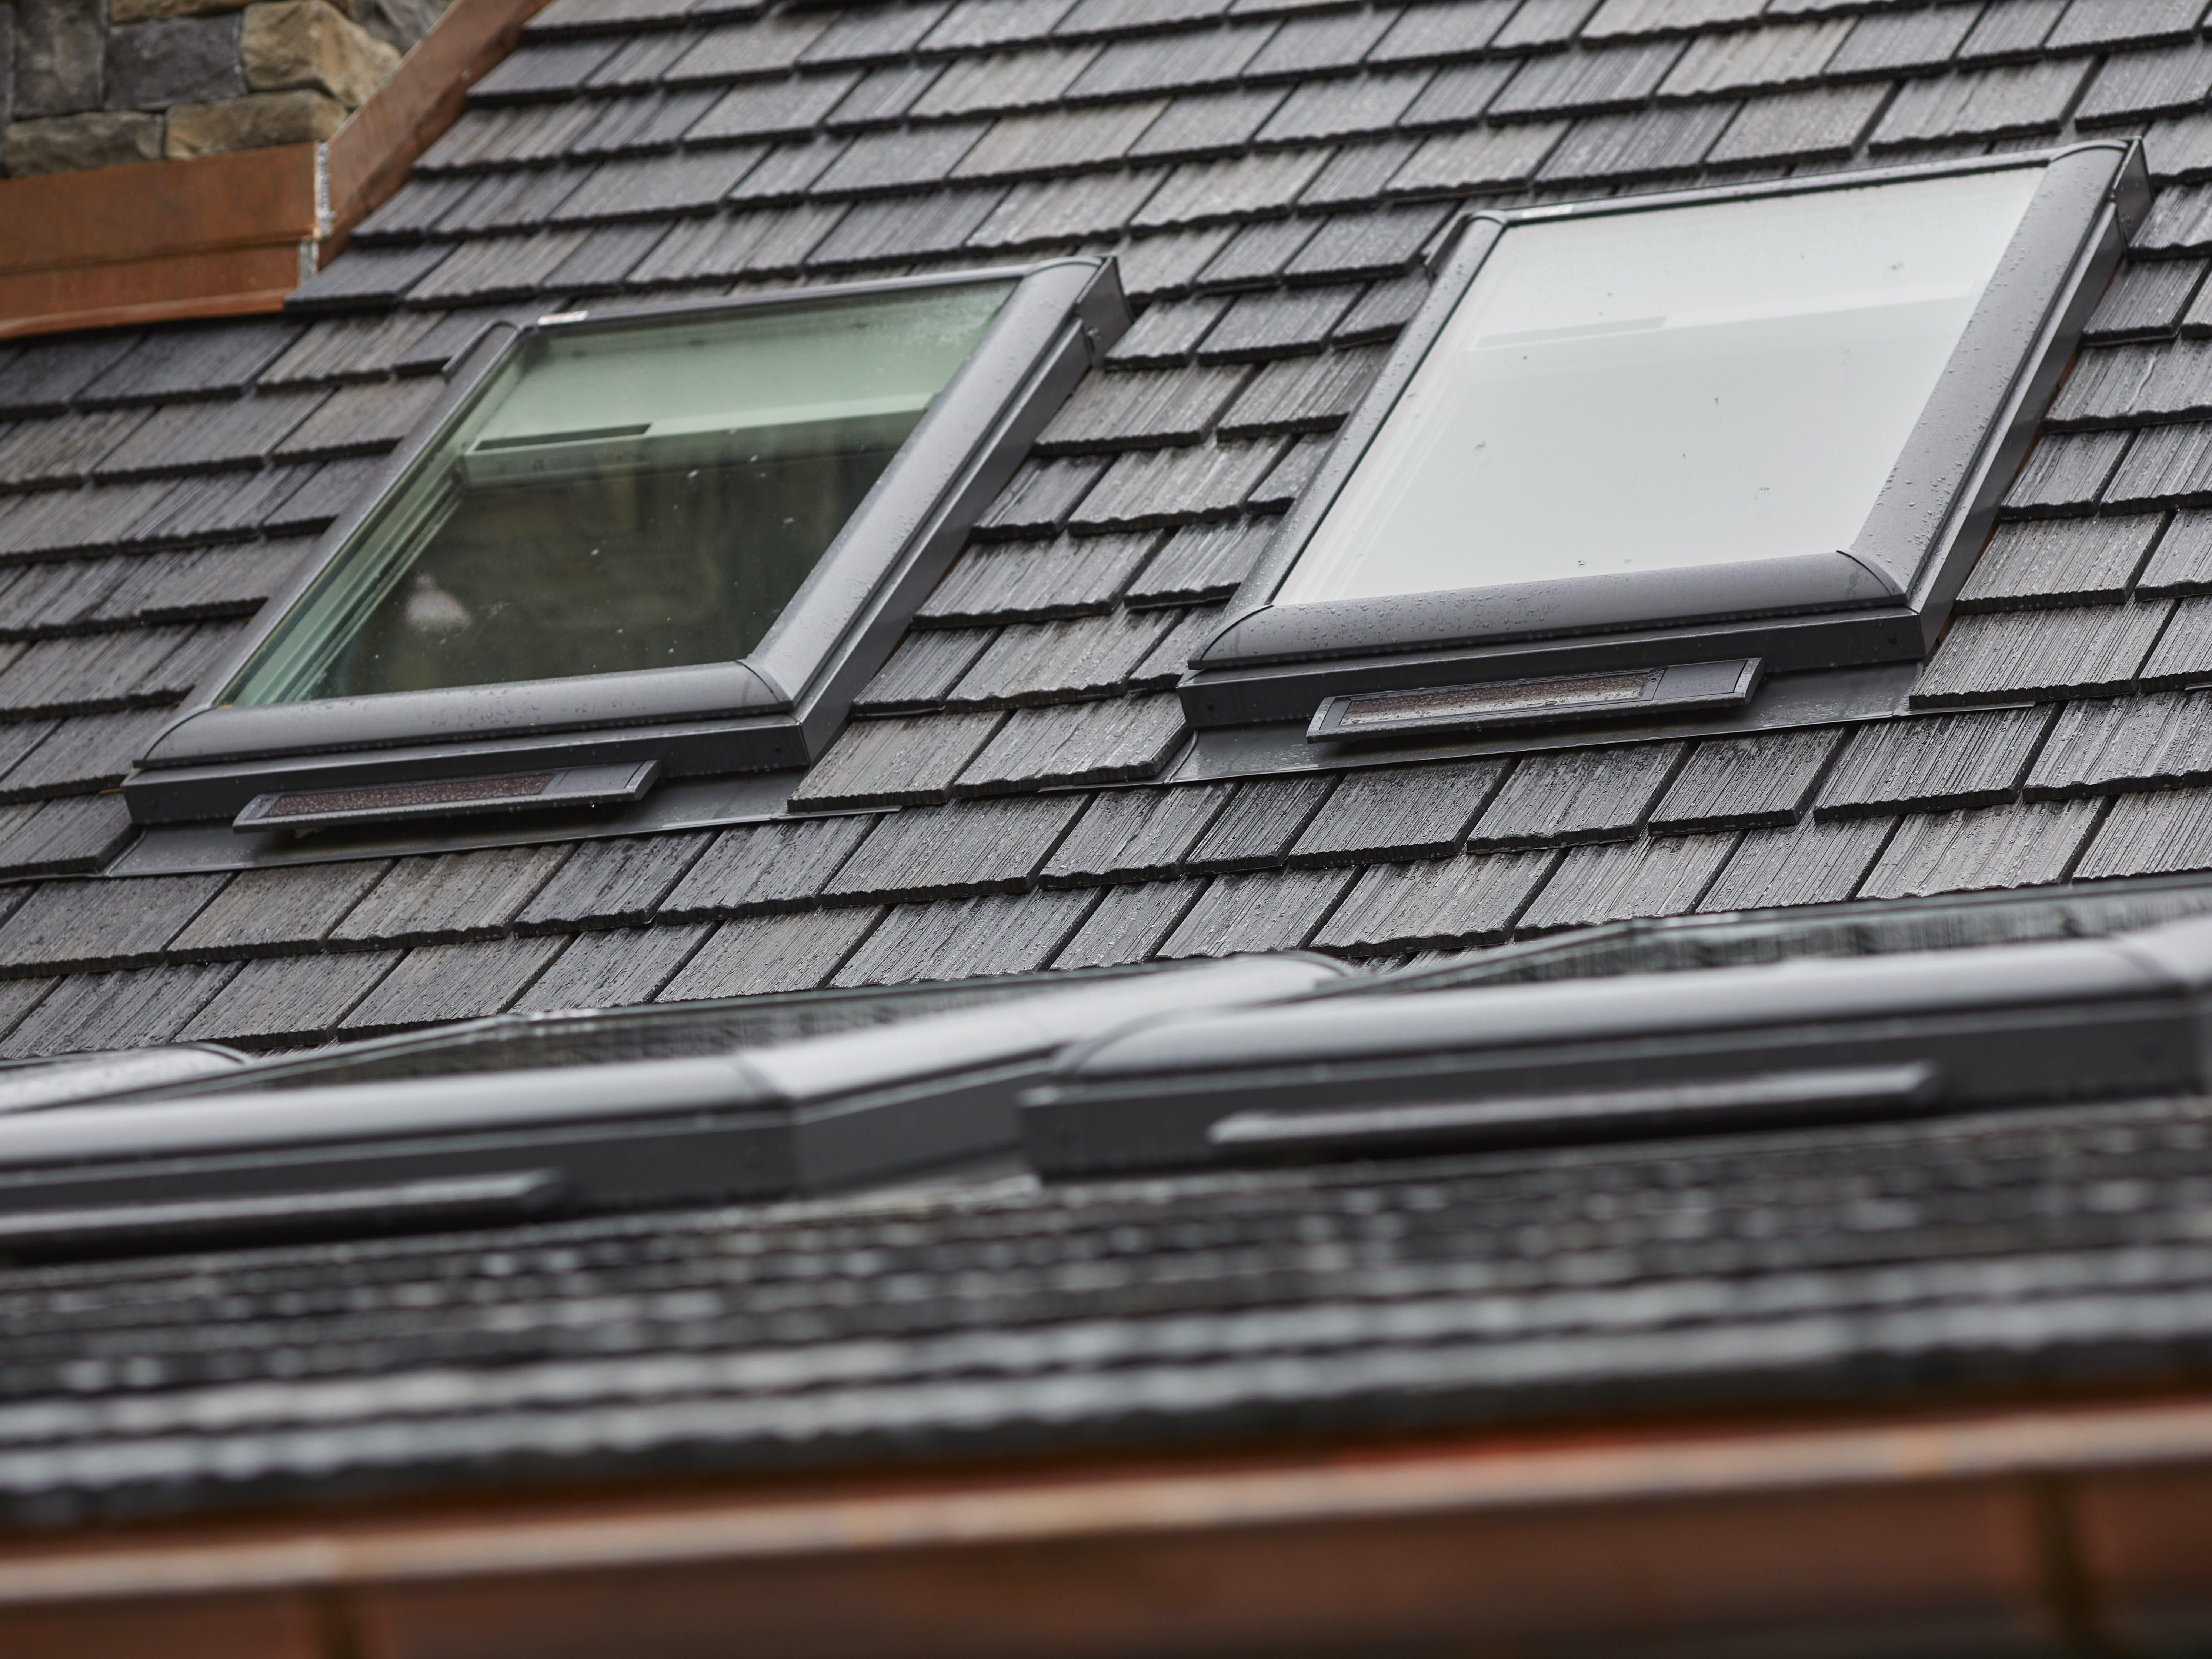 Exterior-skylights-rainy-TOH-house.jpg#asset:6031